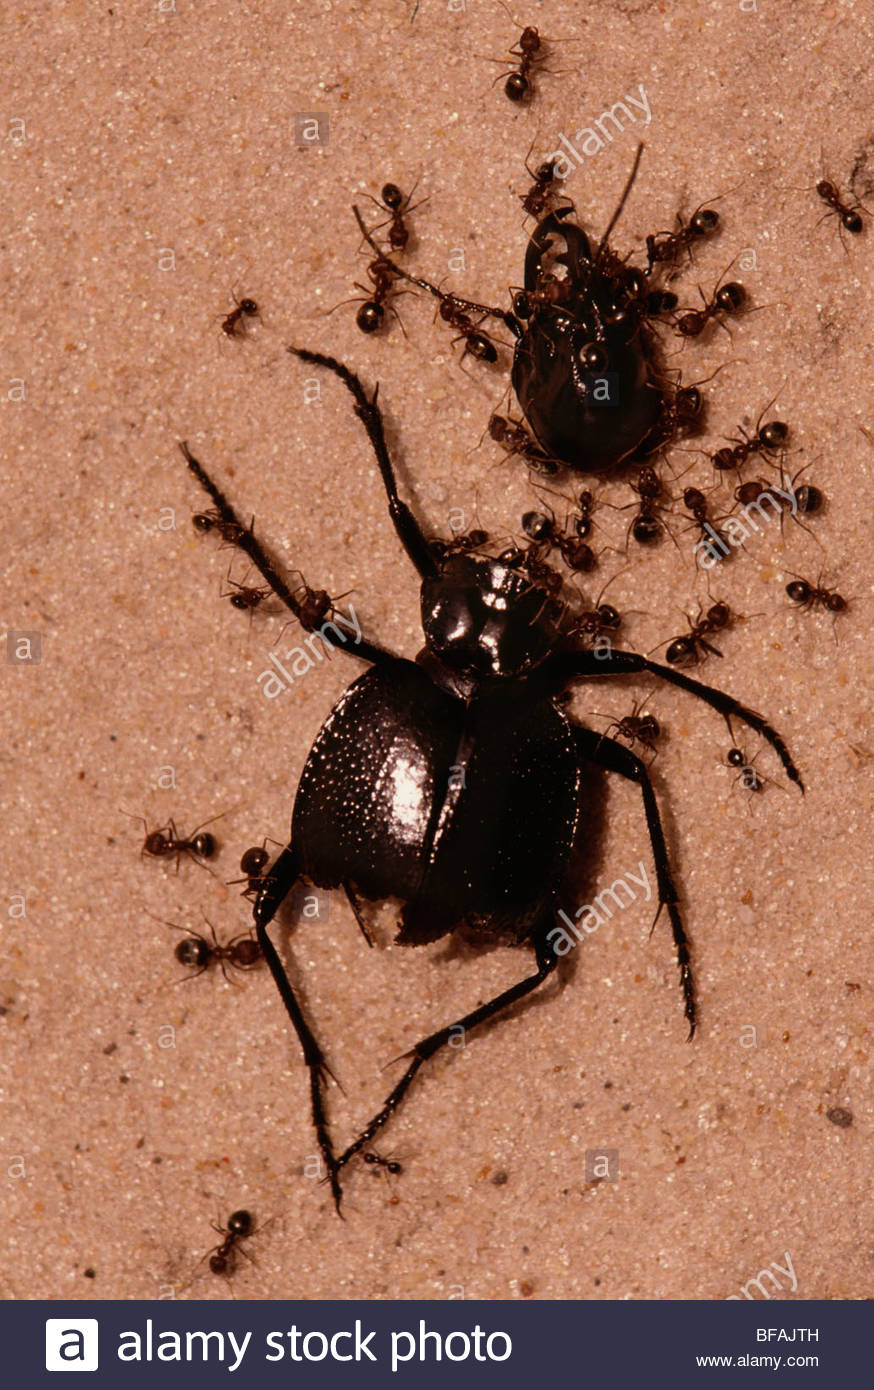 Ants gathering around dead beetle, Botswana - Stock Image